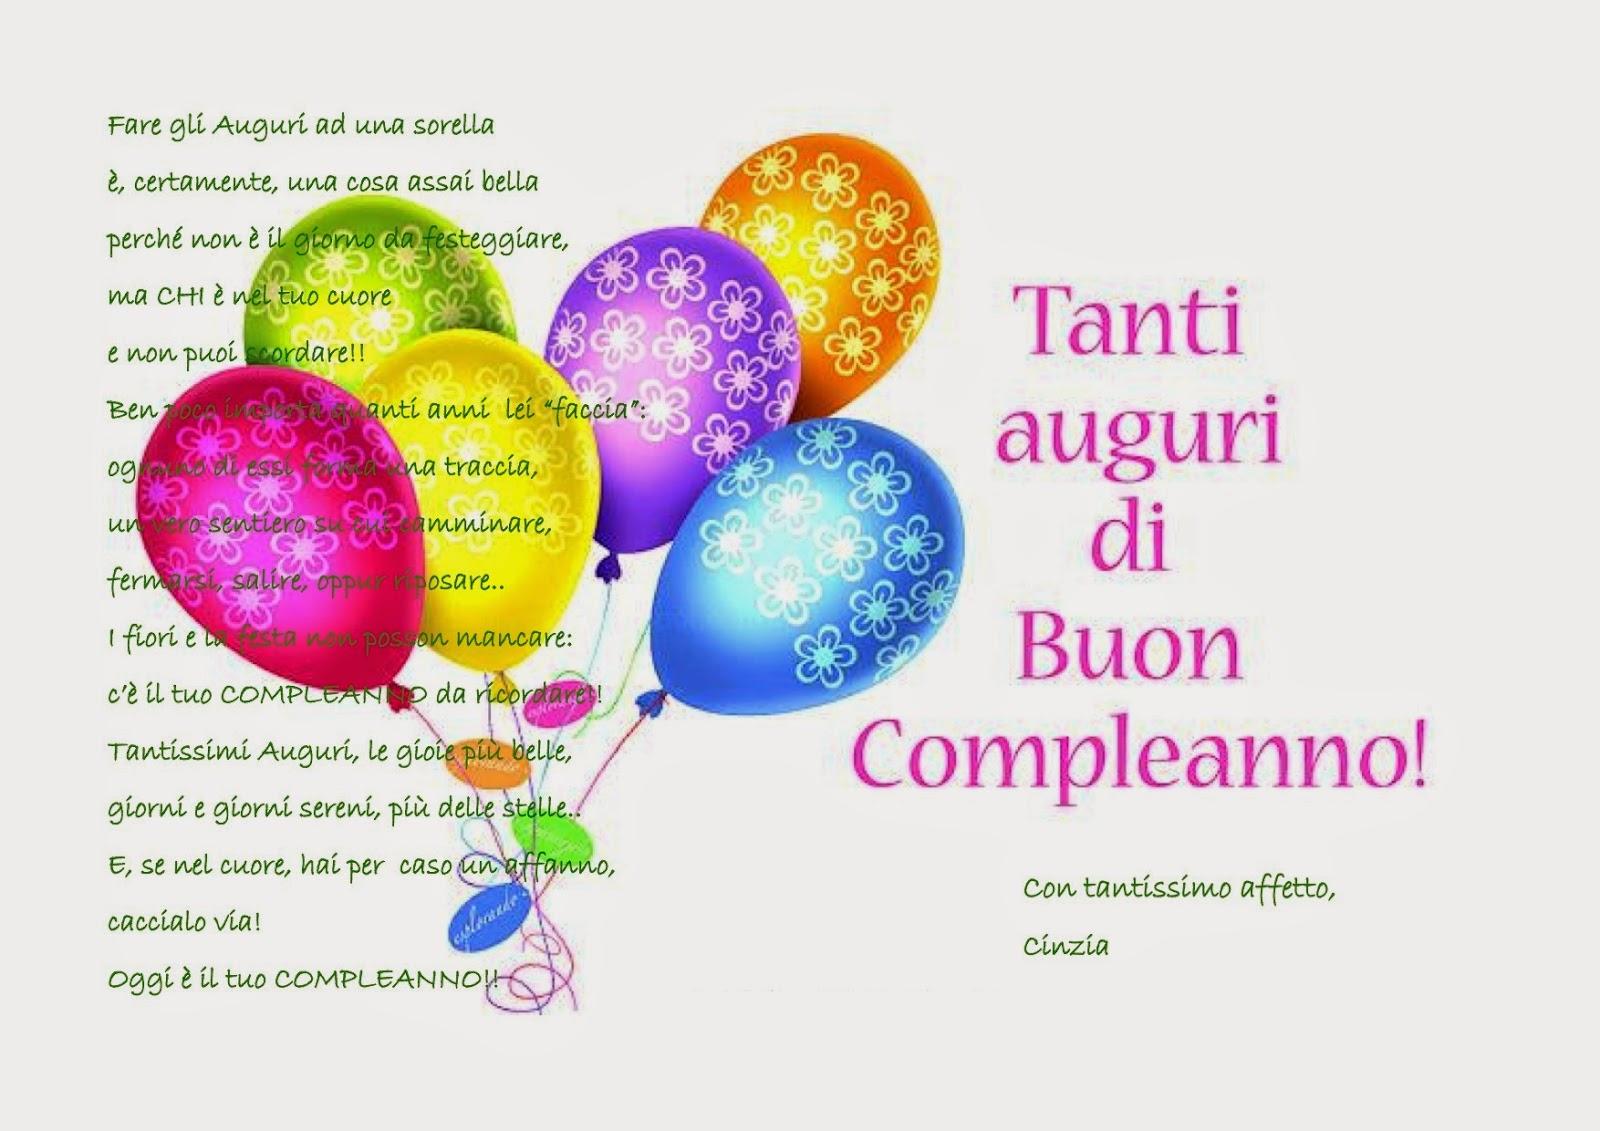 Поздравления с юбилеем от итальянца